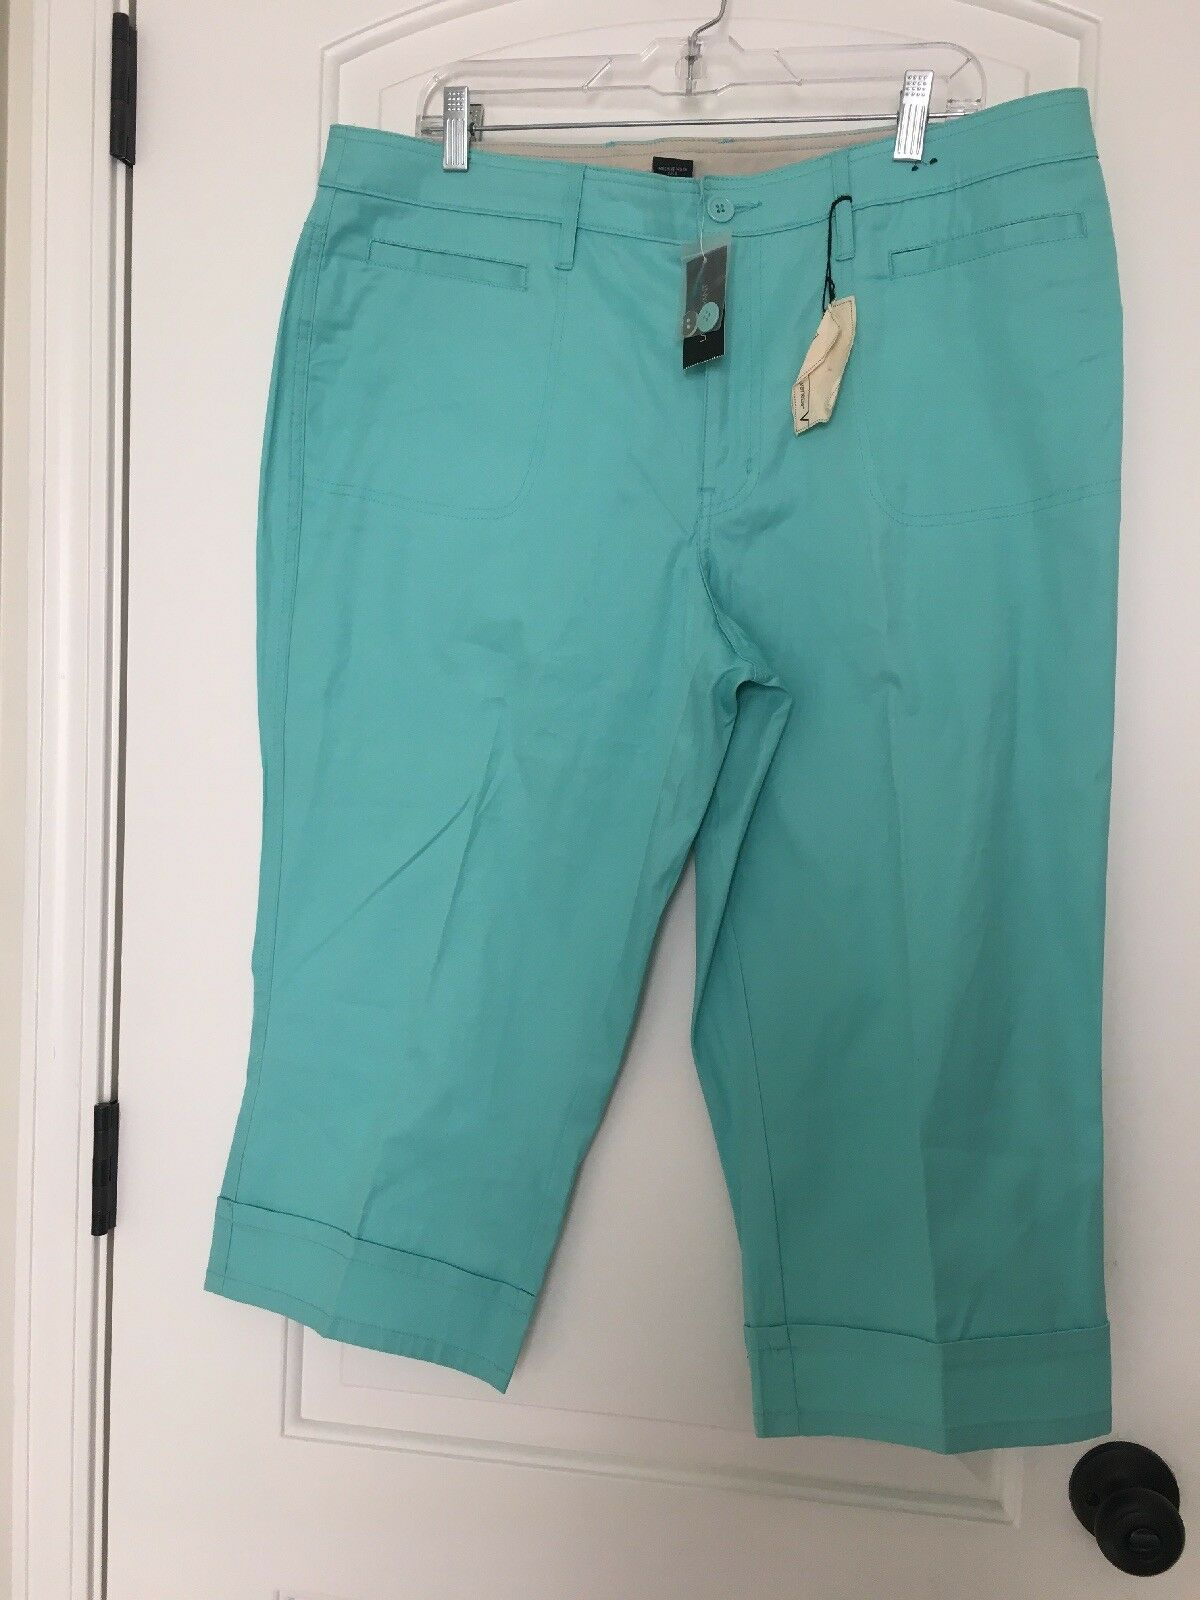 Lane Bryant Venezia Women's Casual Capri Pants Sz 18 Greenish Clothes